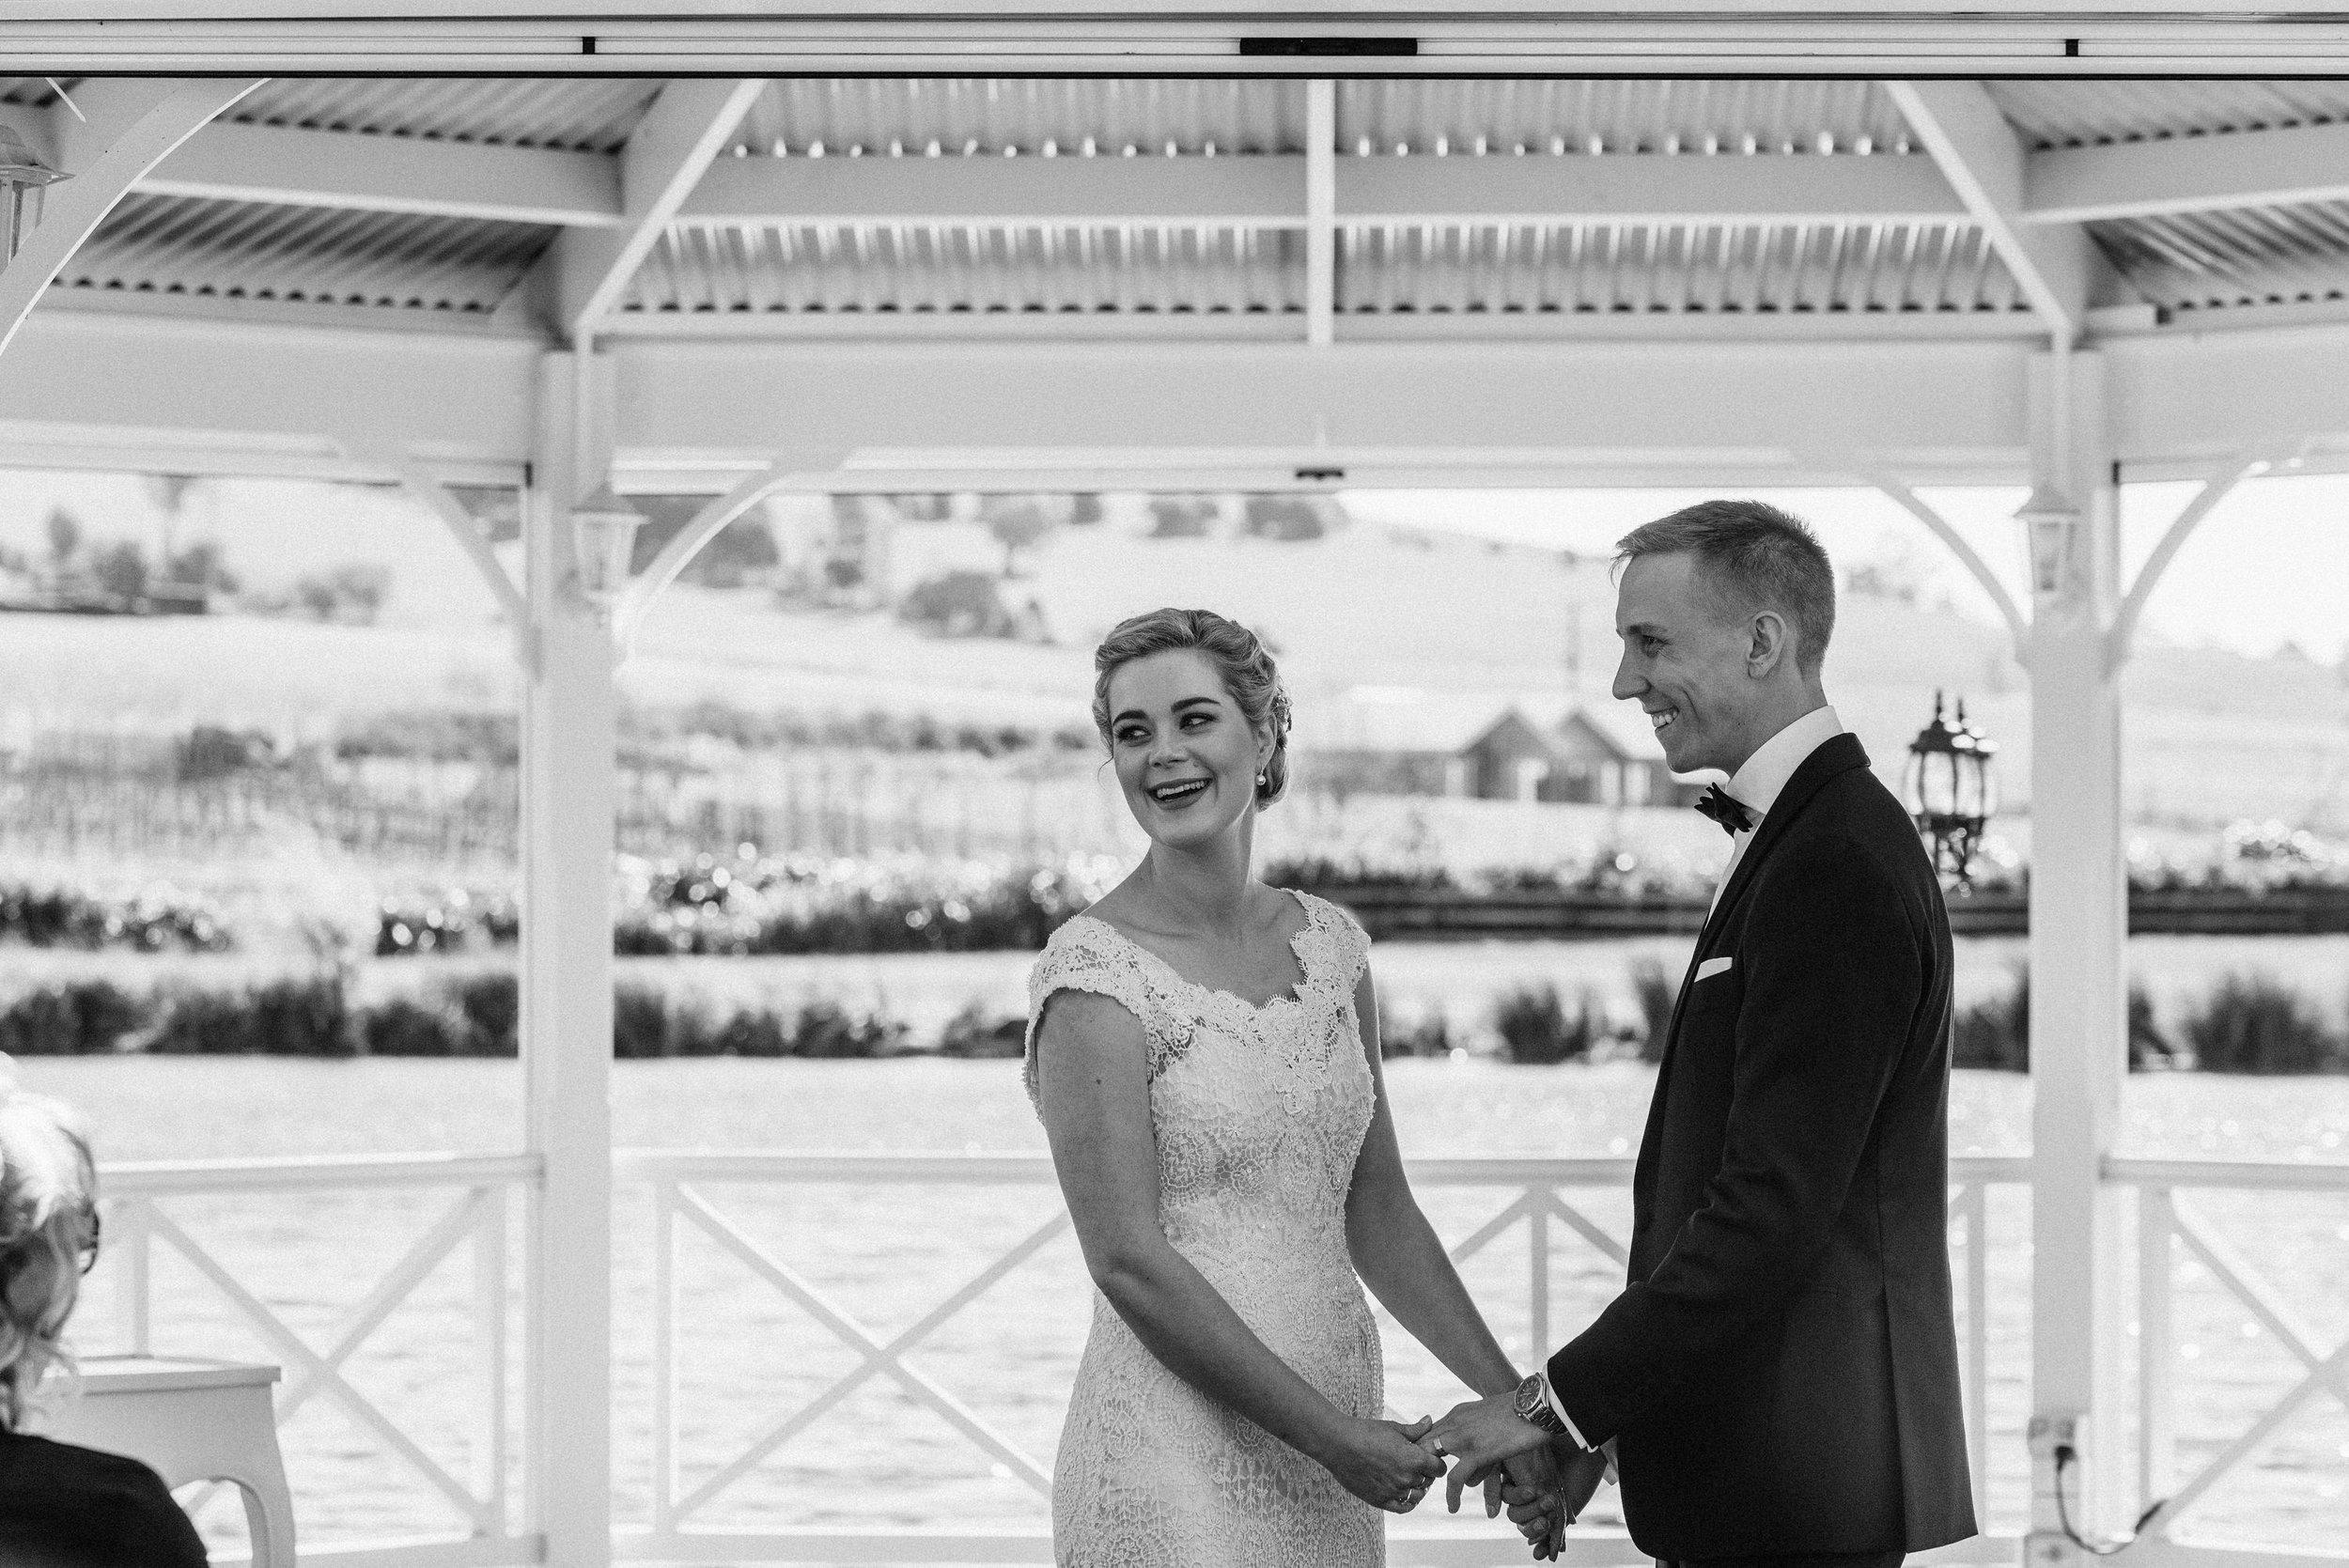 Josef-Chromy-Wedding-41.jpg